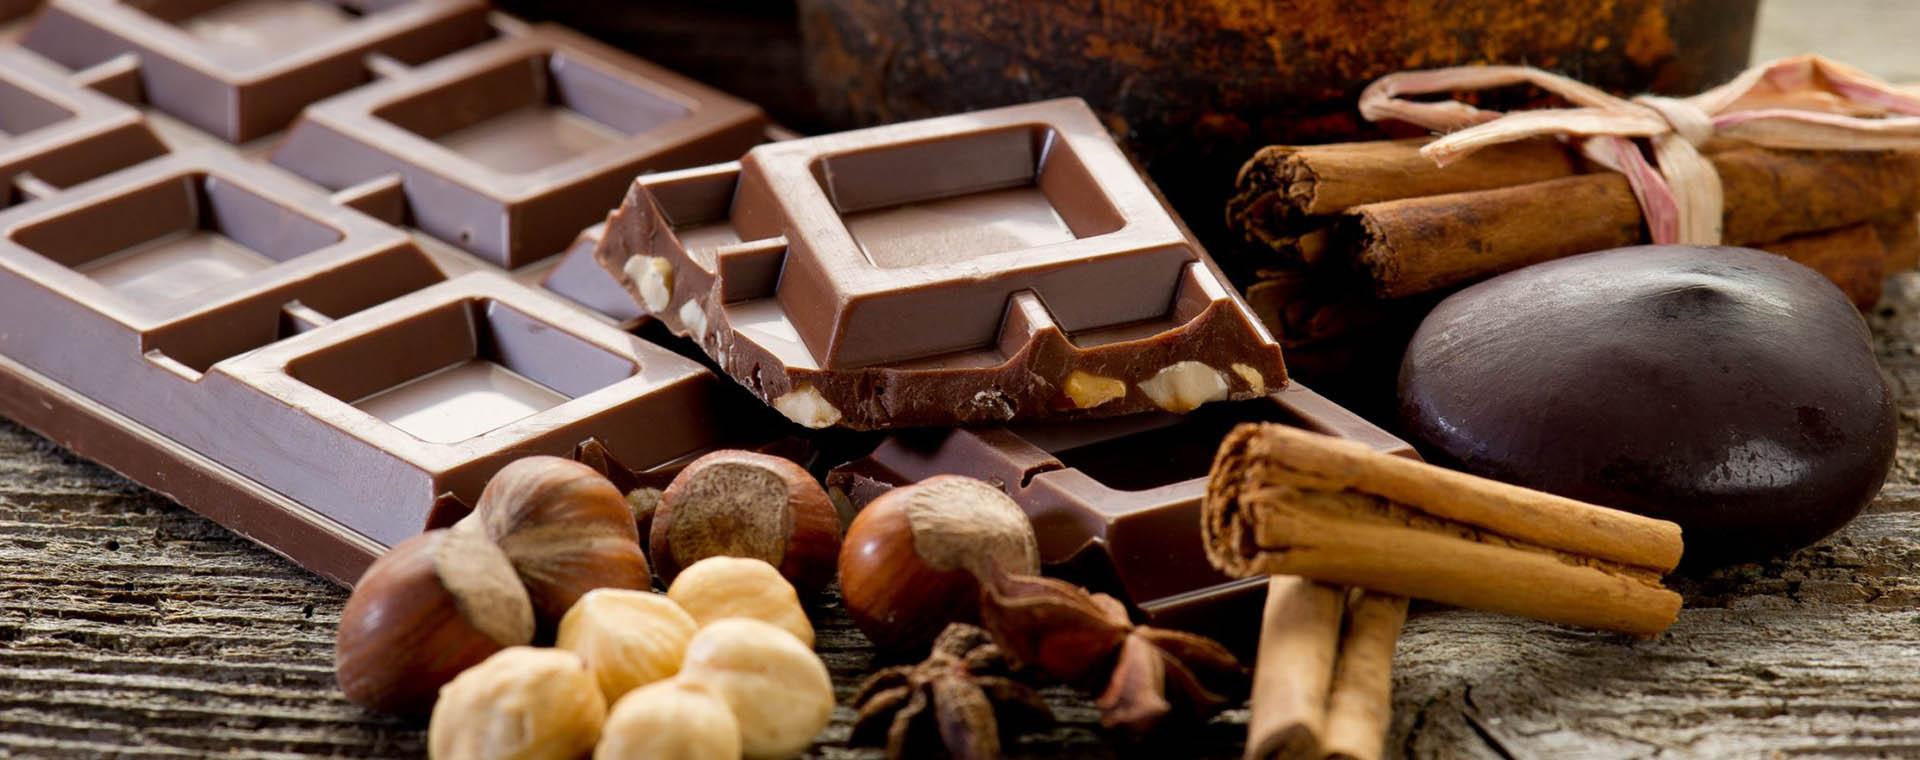 Урок шоколада made in Pisa - экскурсии с гидом Ирина Лихота